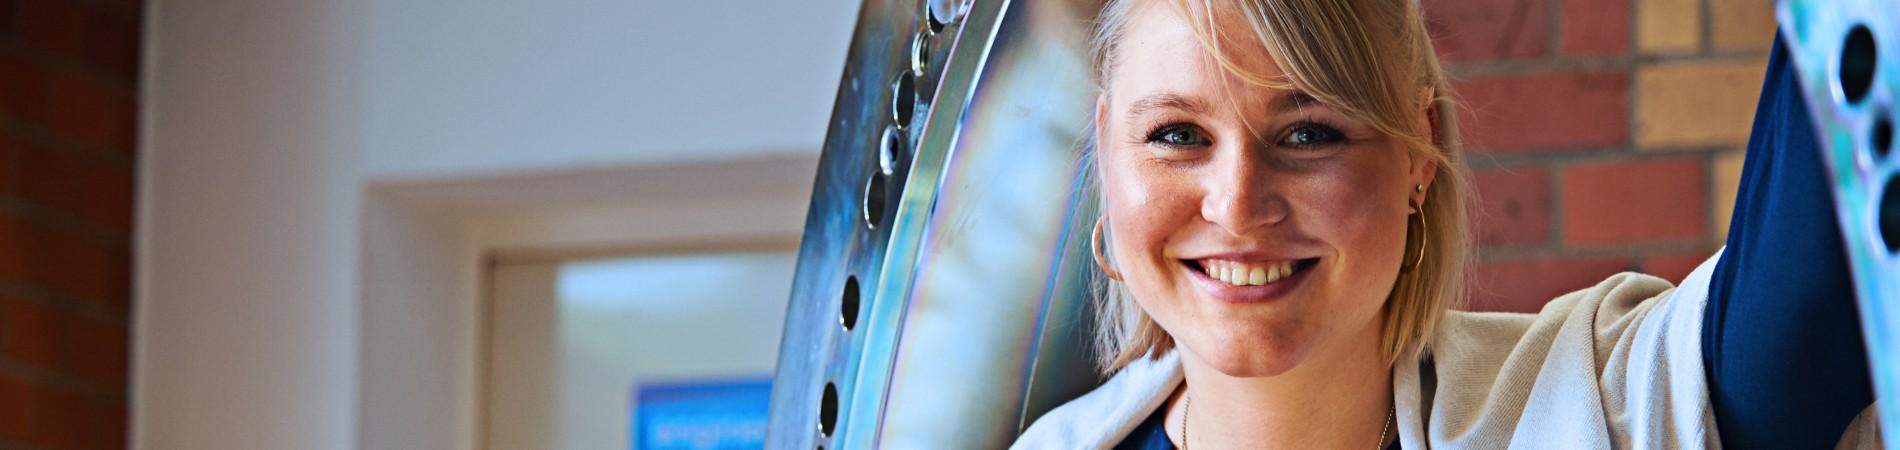 thyssenkrupp Bearings employee experience report Theresa von Blumenthal